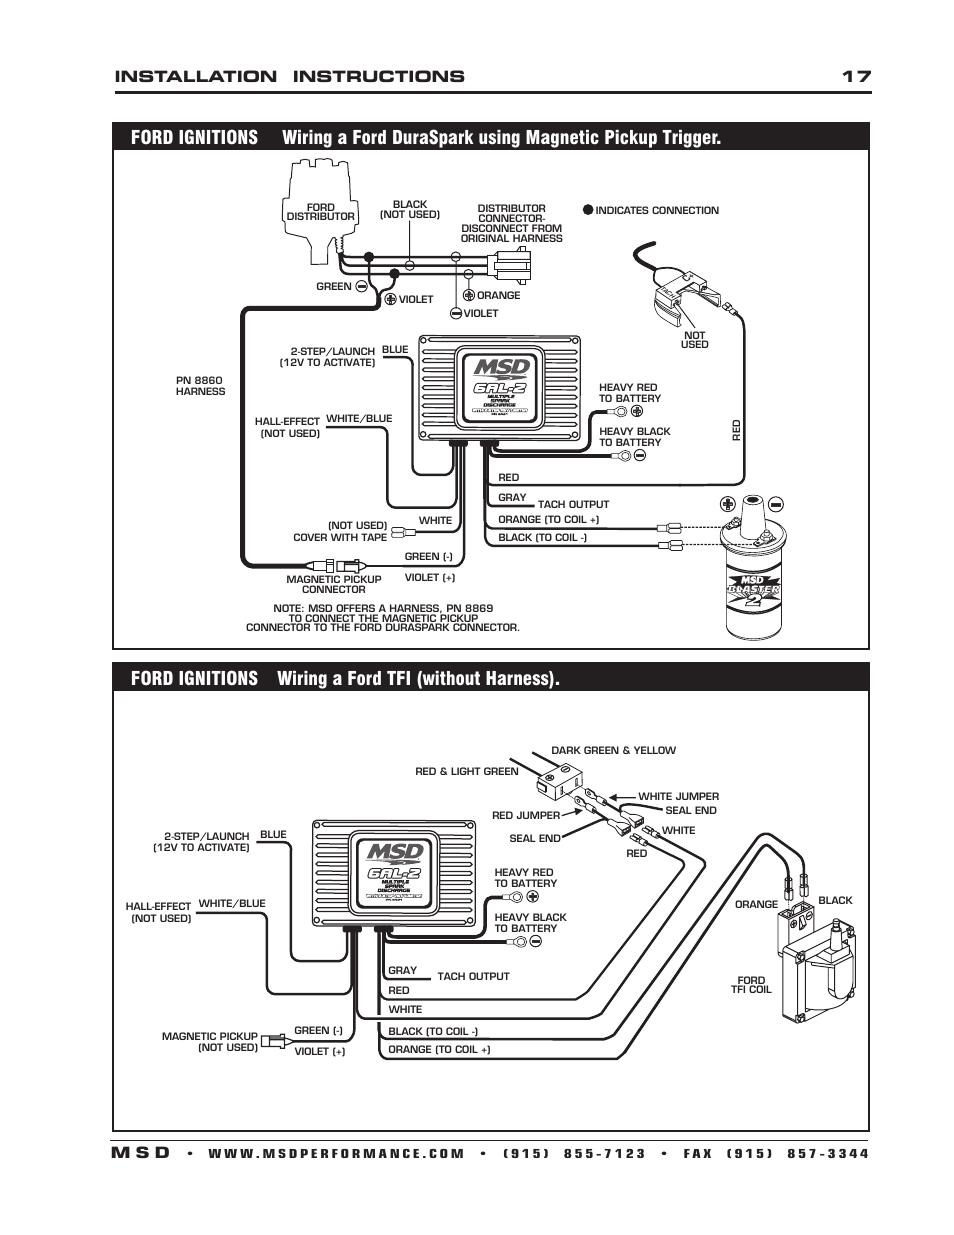 DIAGRAM] Msd Wiring Diagram 6m 2 FULL Version HD Quality 6m 2 -  MIRACLEJEAN.KINGGO.FR